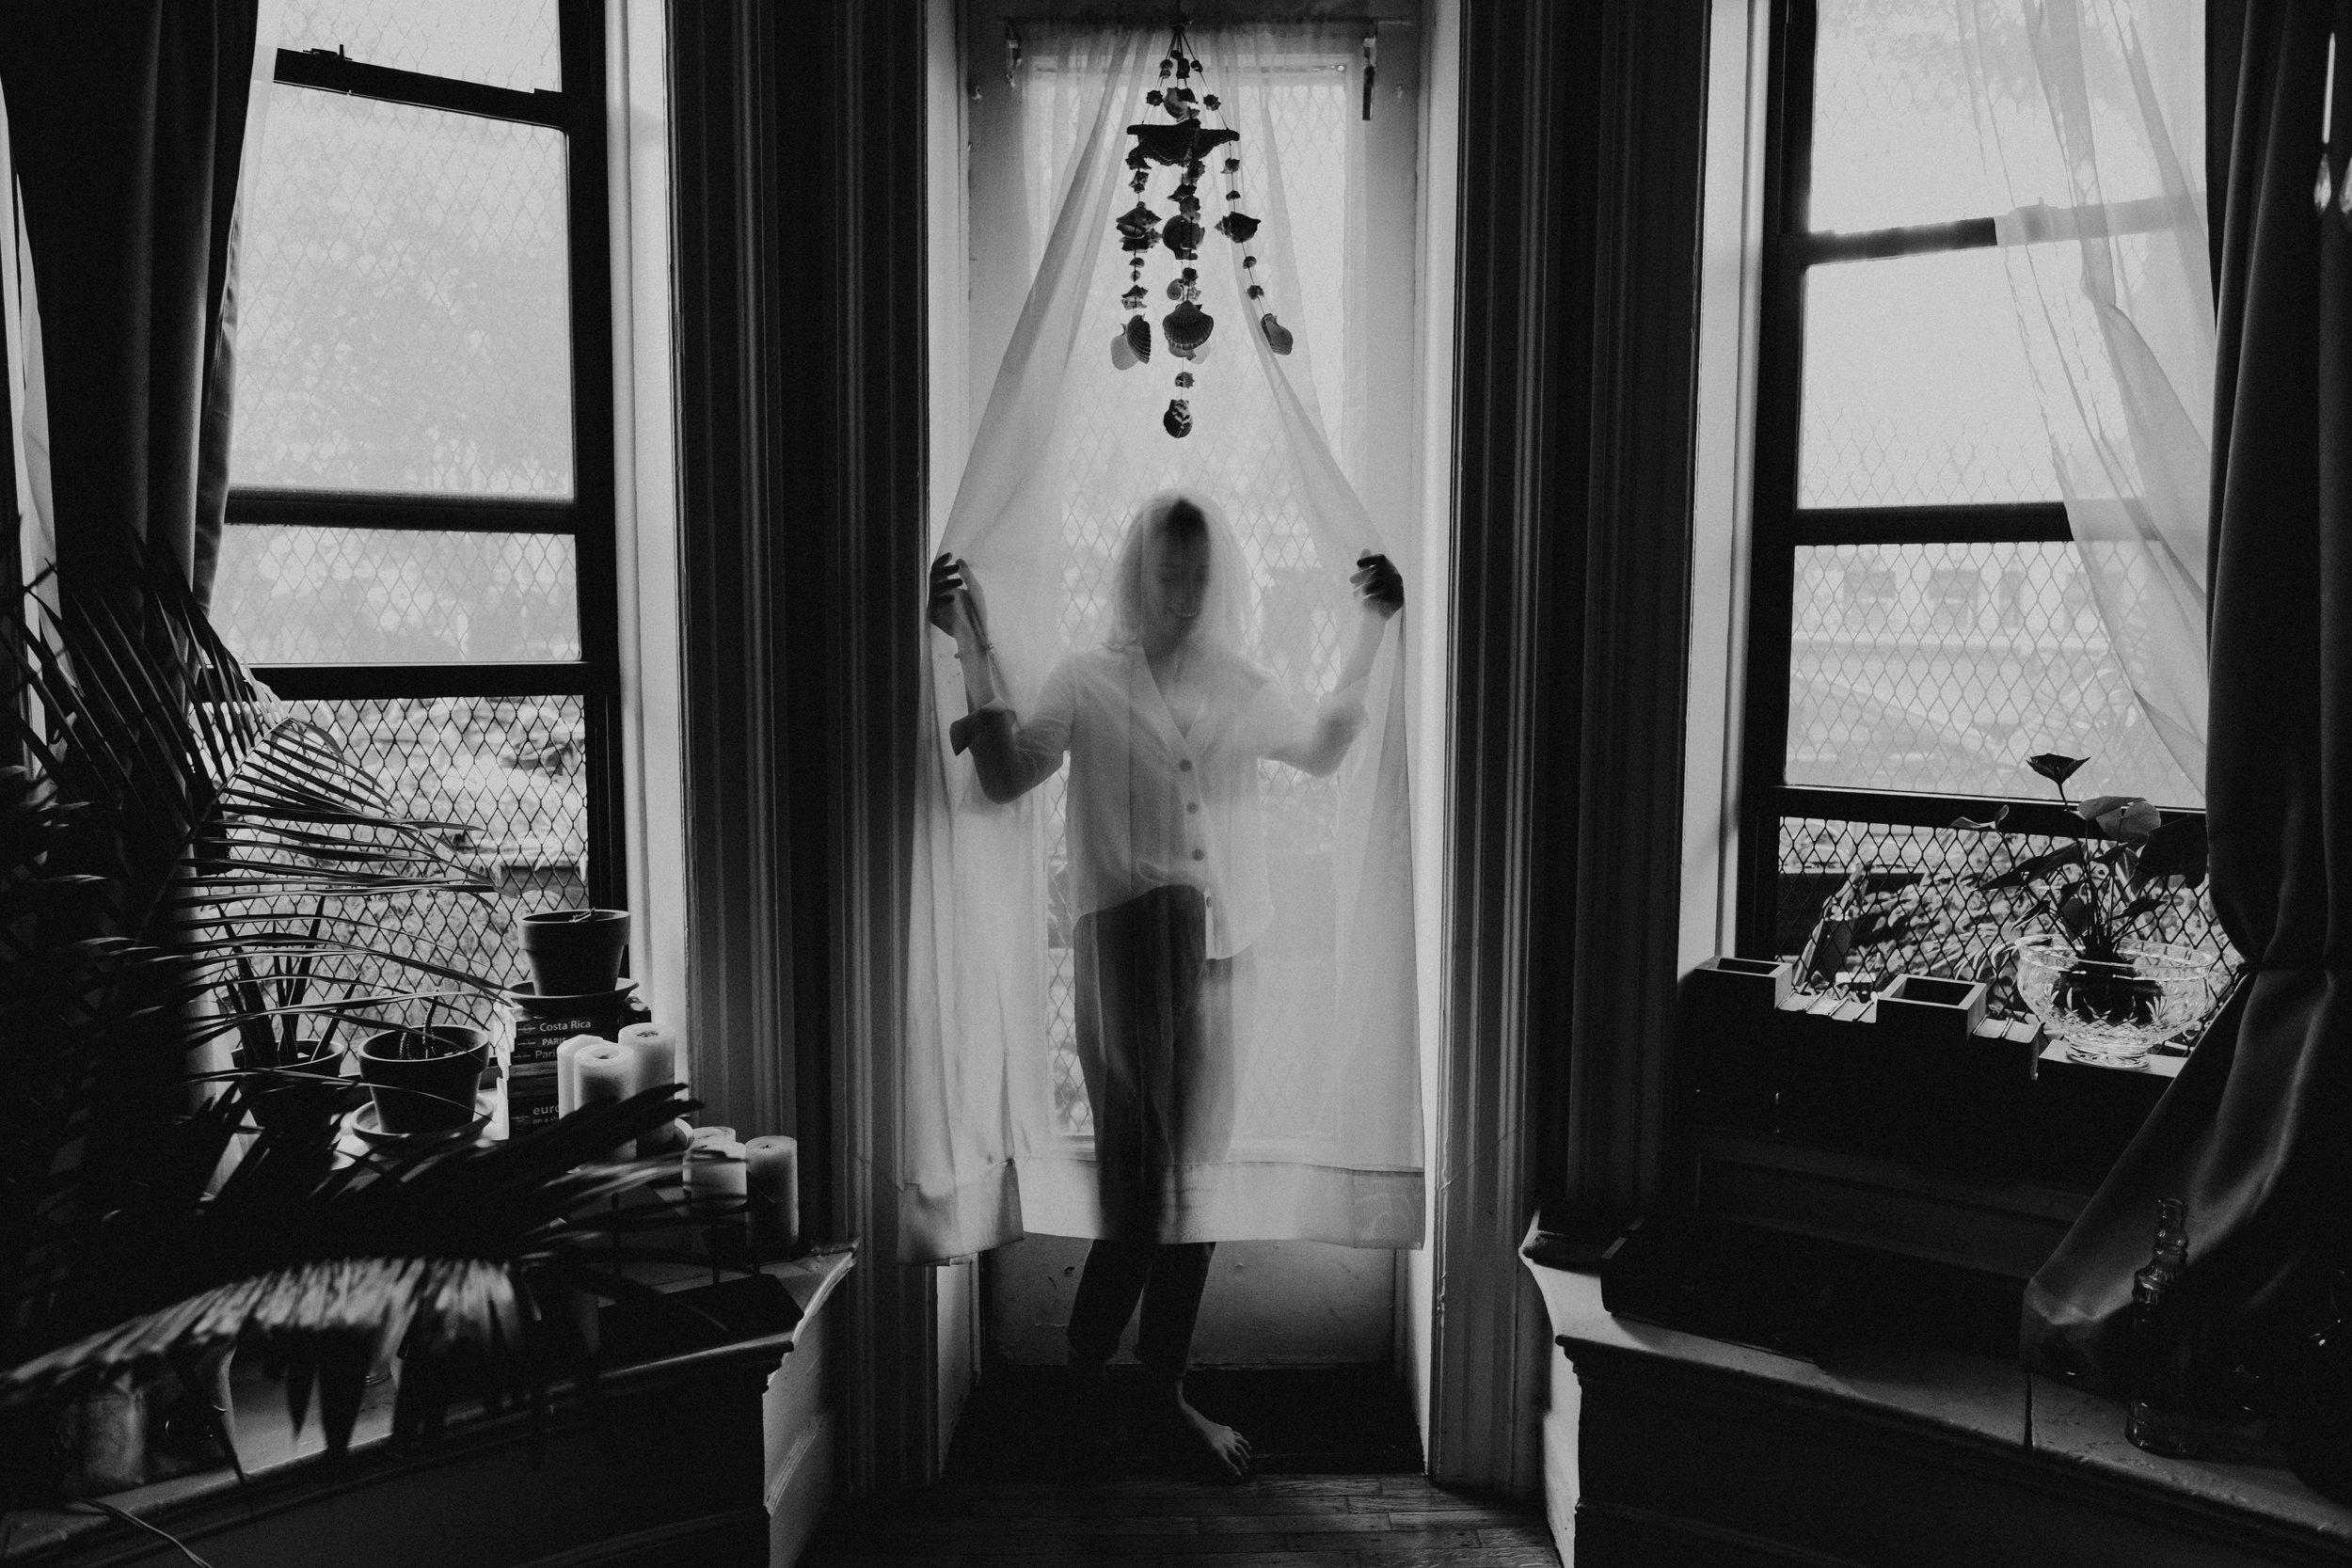 CHELLISE_MICHAEL_PHOTOGRAPHY_BEDSTUY_PORTRAITS-3075.jpg